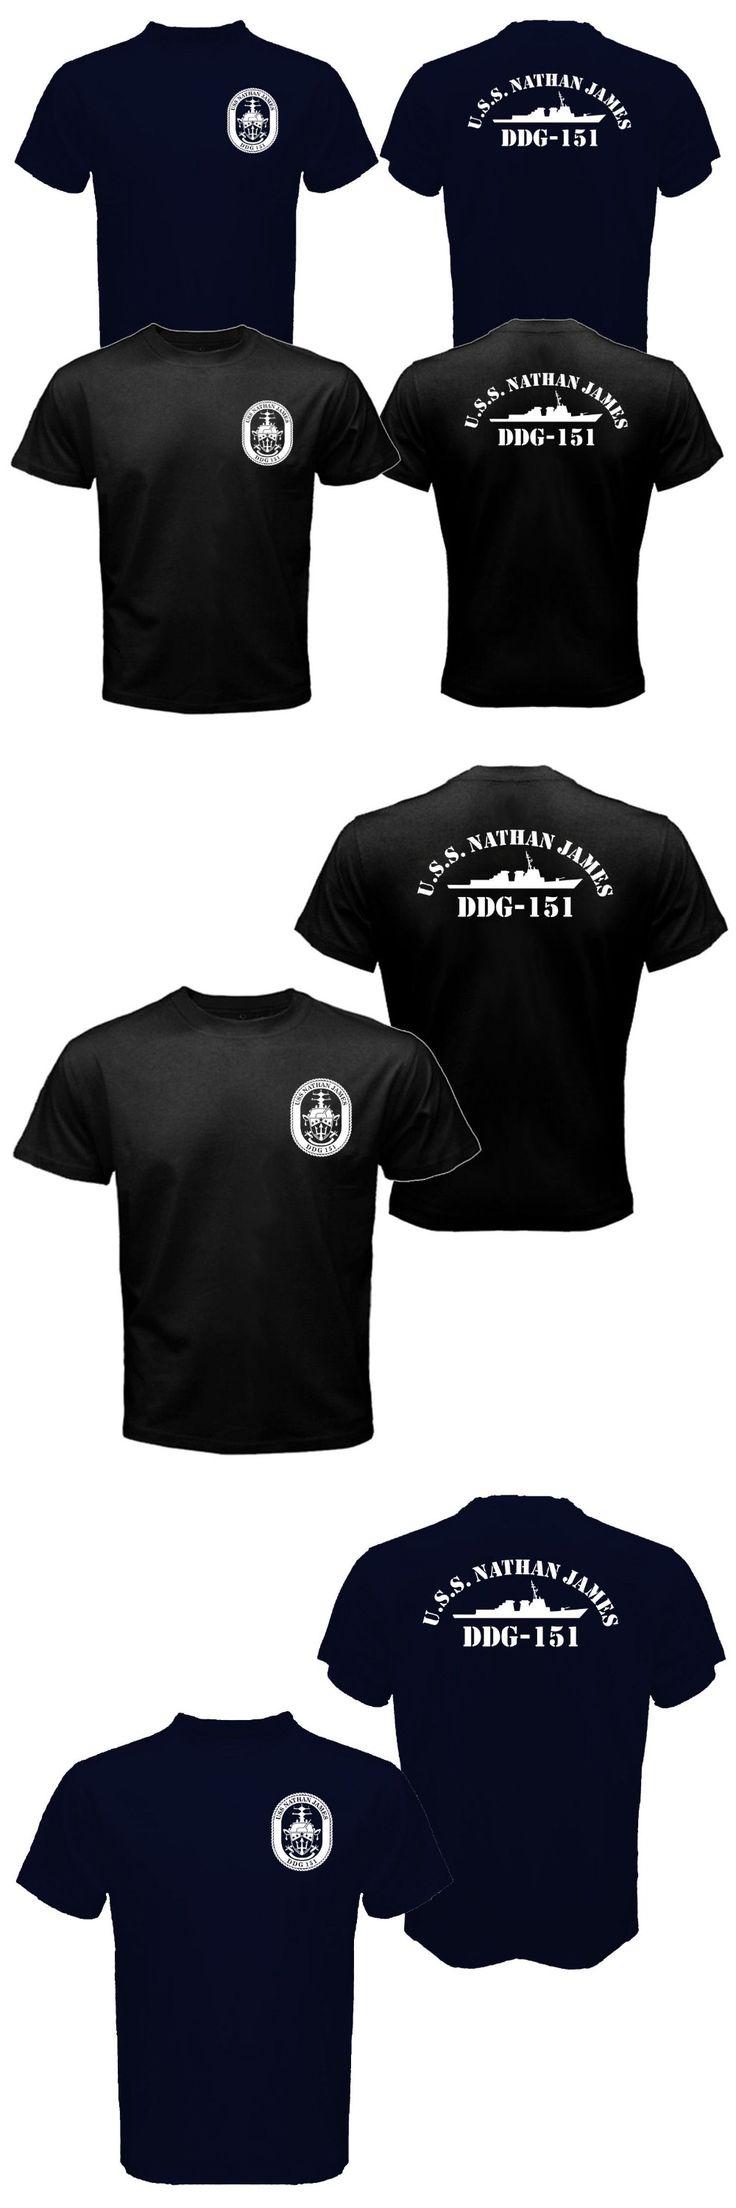 New The Last Ship USS Nathan James DDG-151 US Navy Seal TV Series T-shirt Mens 100% Cotton Tee Shirt S-XXXL